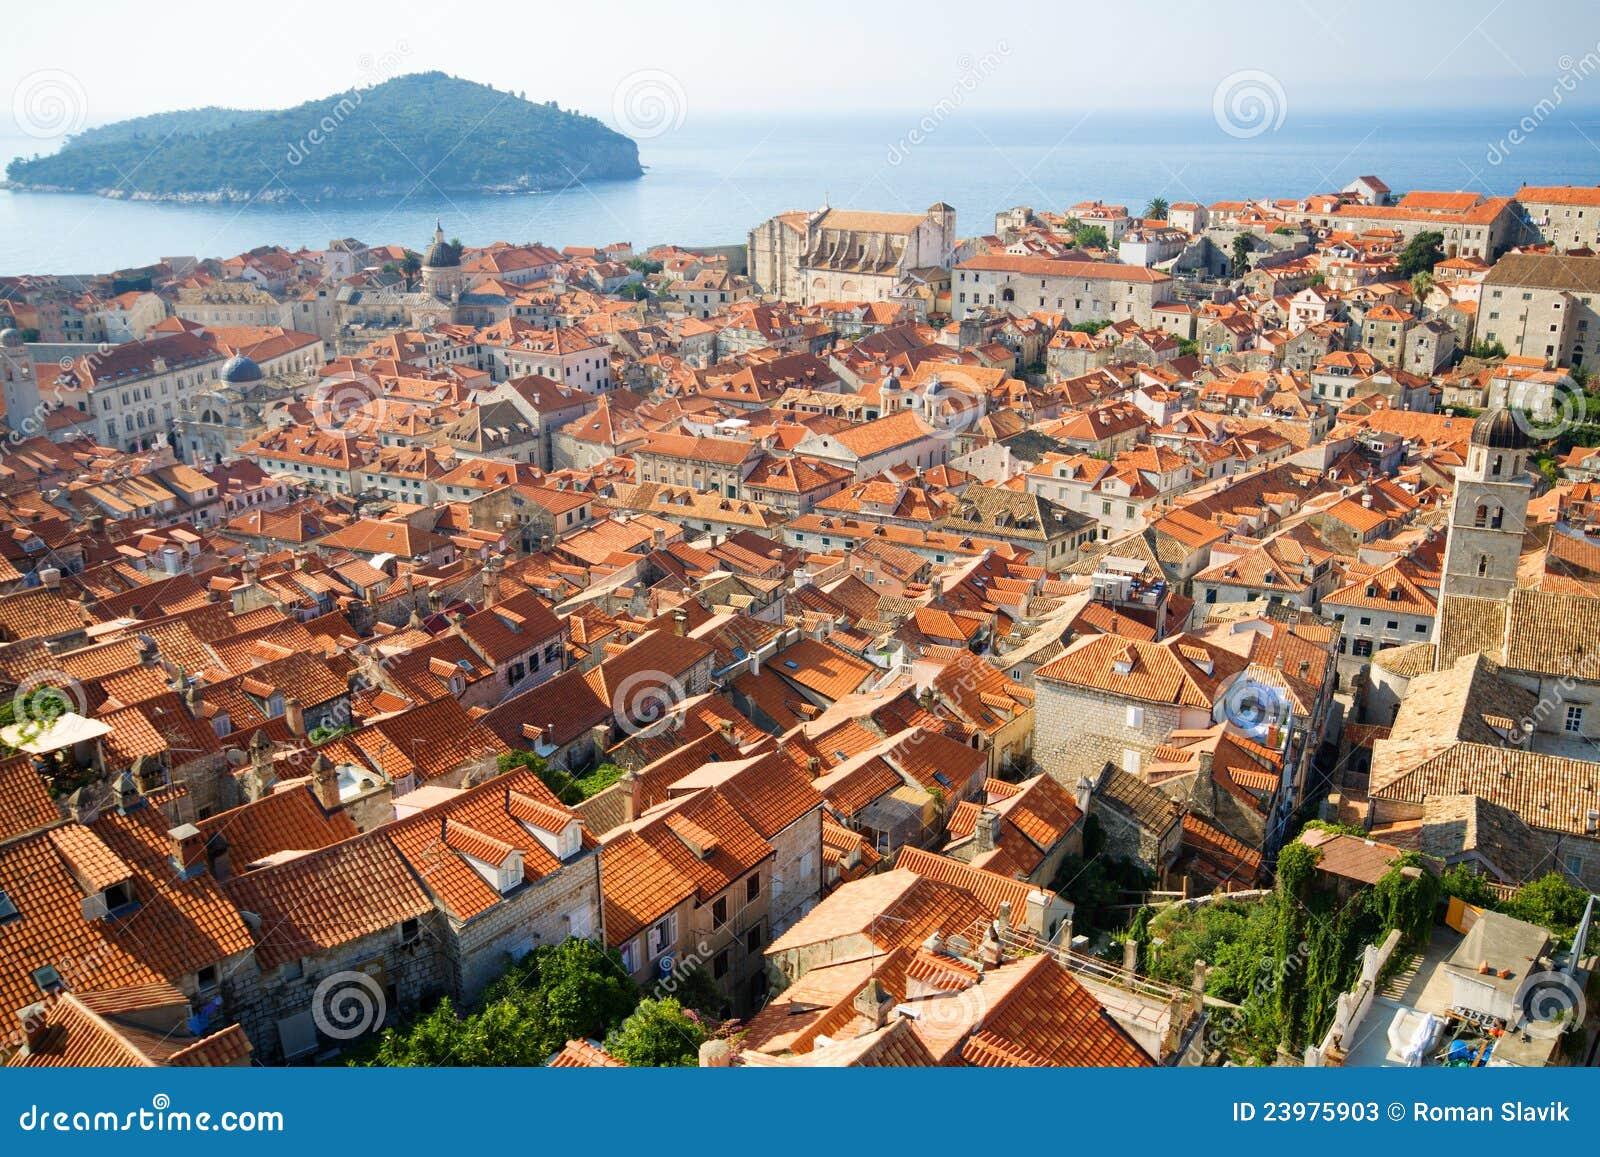 travel sea wallpaper panorama - photo #41